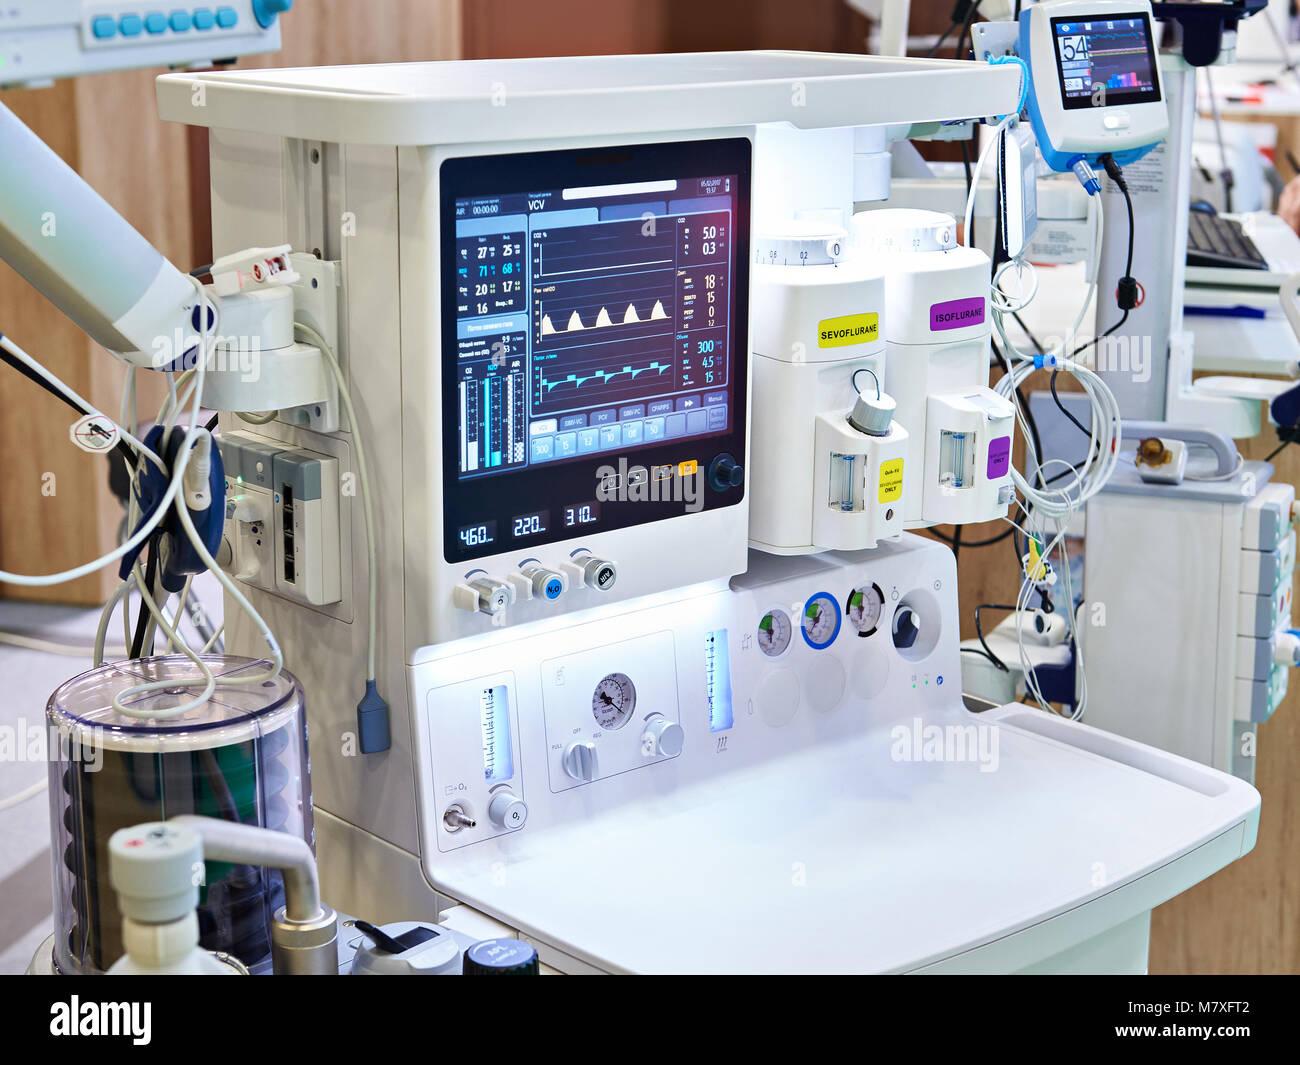 Inhalation anaesthetic machine with monitor Stock Photo